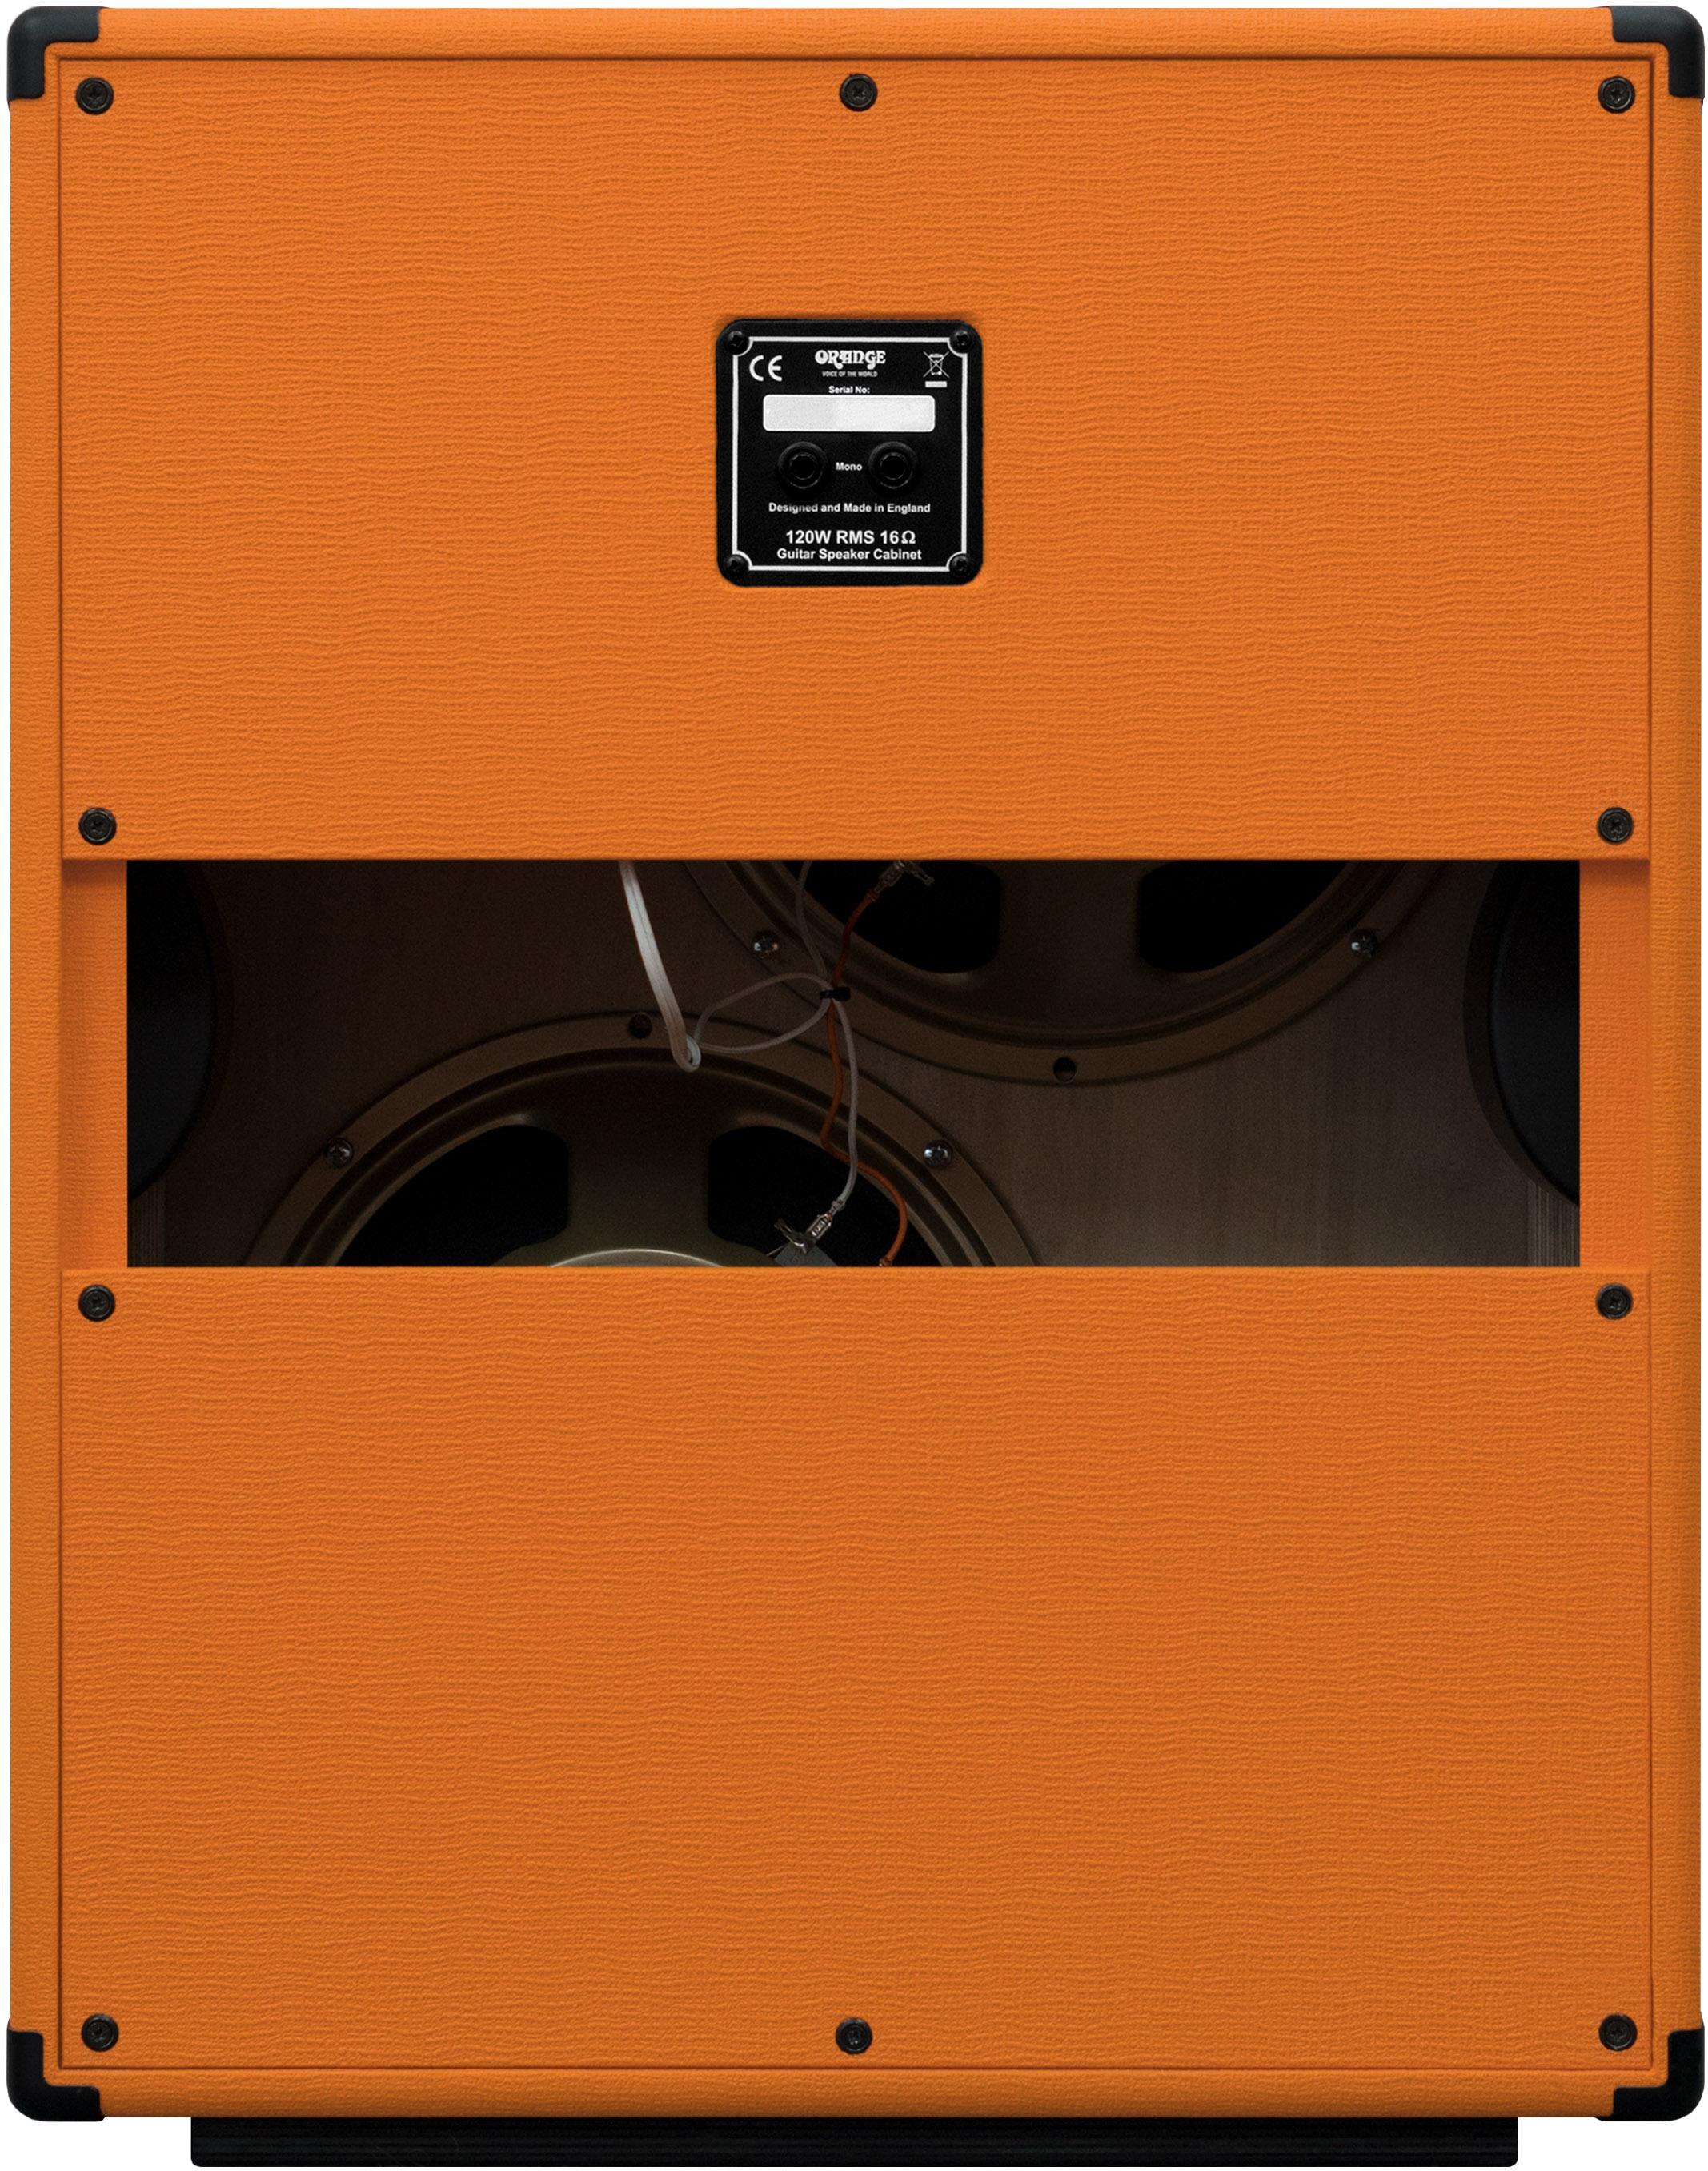 Orange-PPC212V-2x12-Inch-Vertical-Guitar-Amplifier-Cabinet thumbnail 5